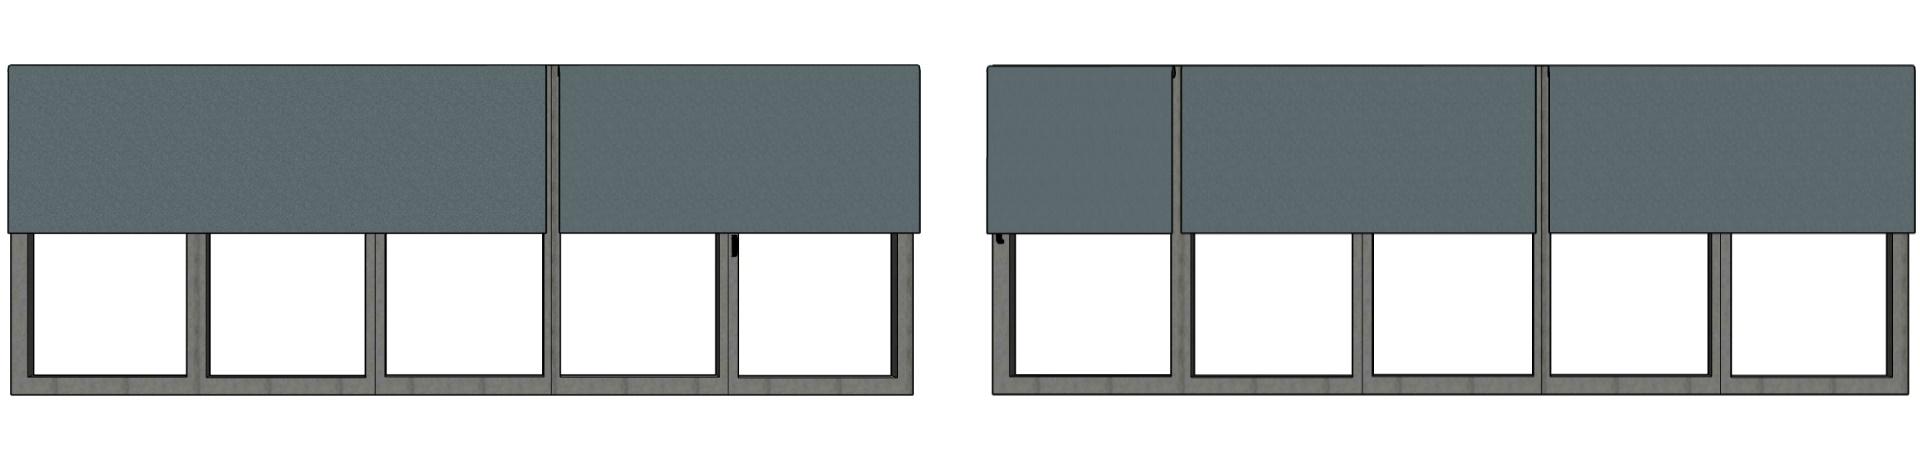 5-panel bi-fold door blinds configuration